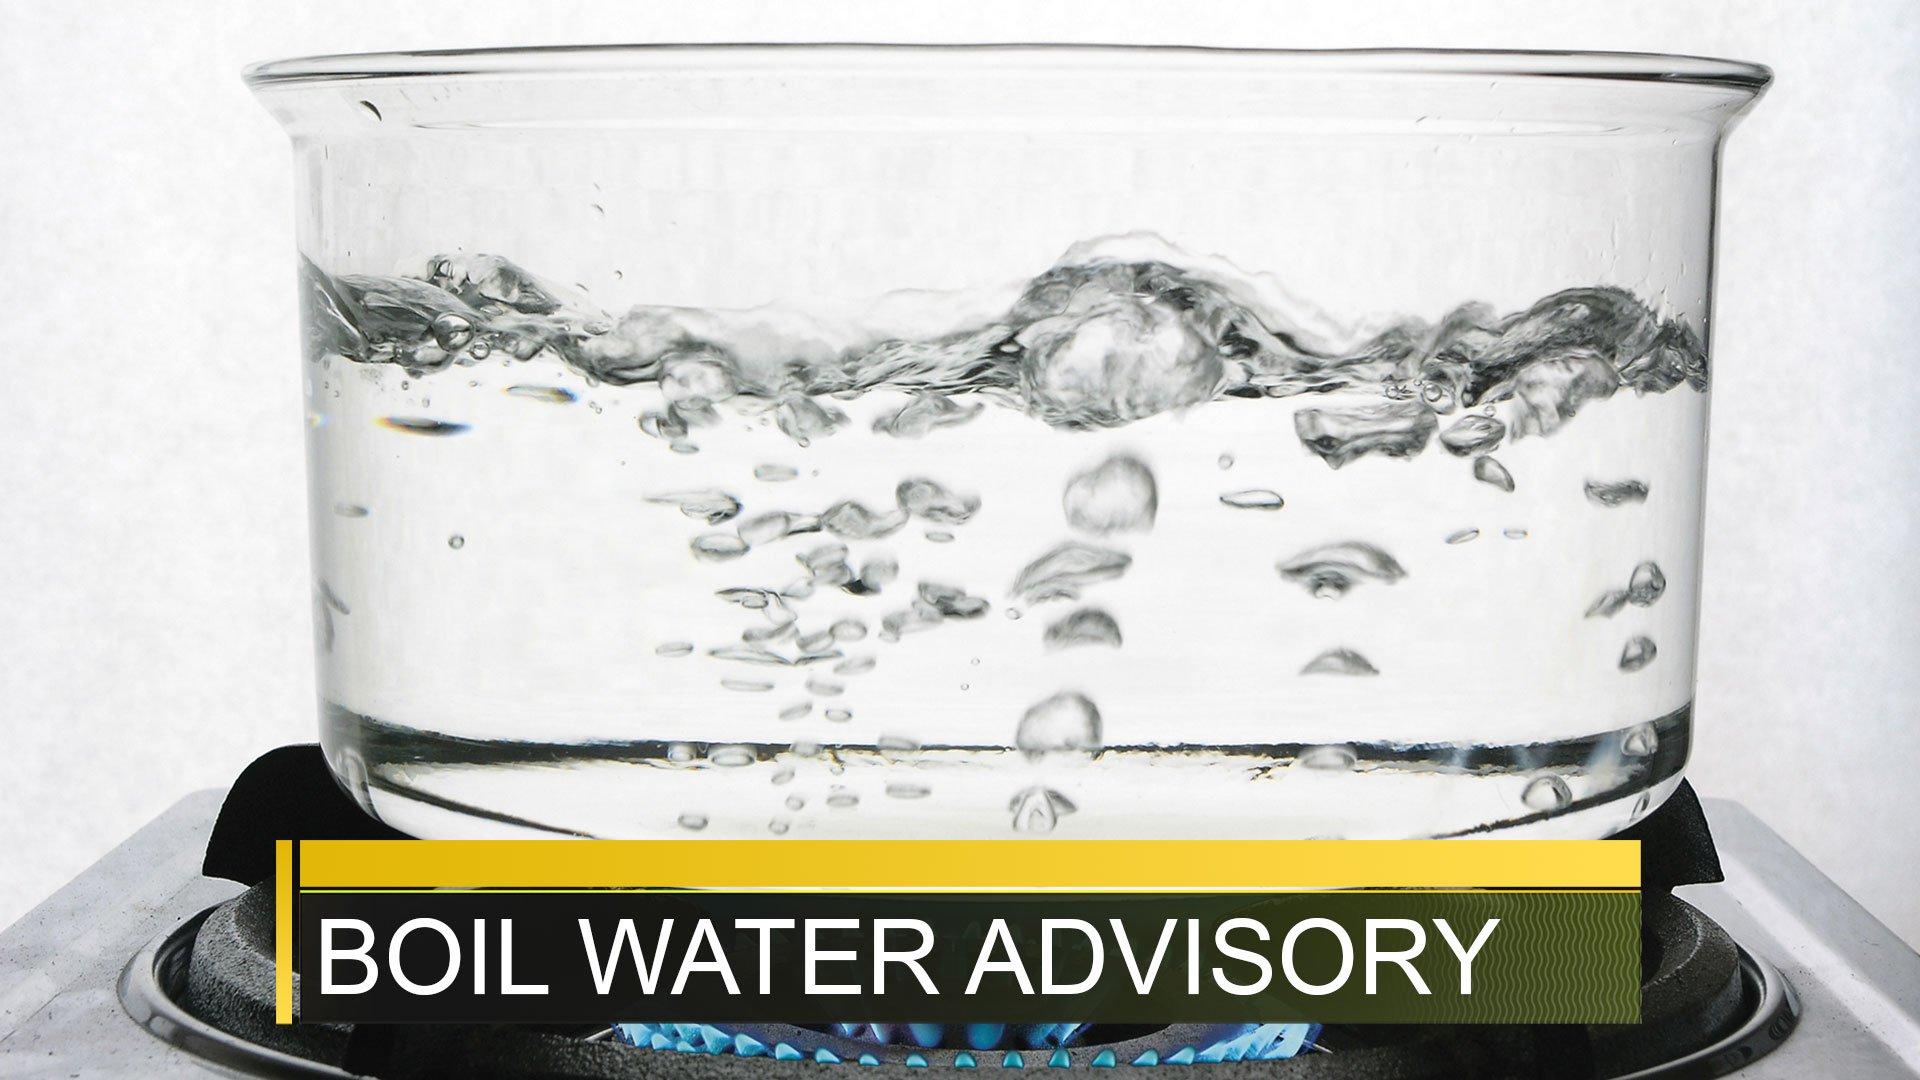 Boil Water Advisory; Source: WFXG